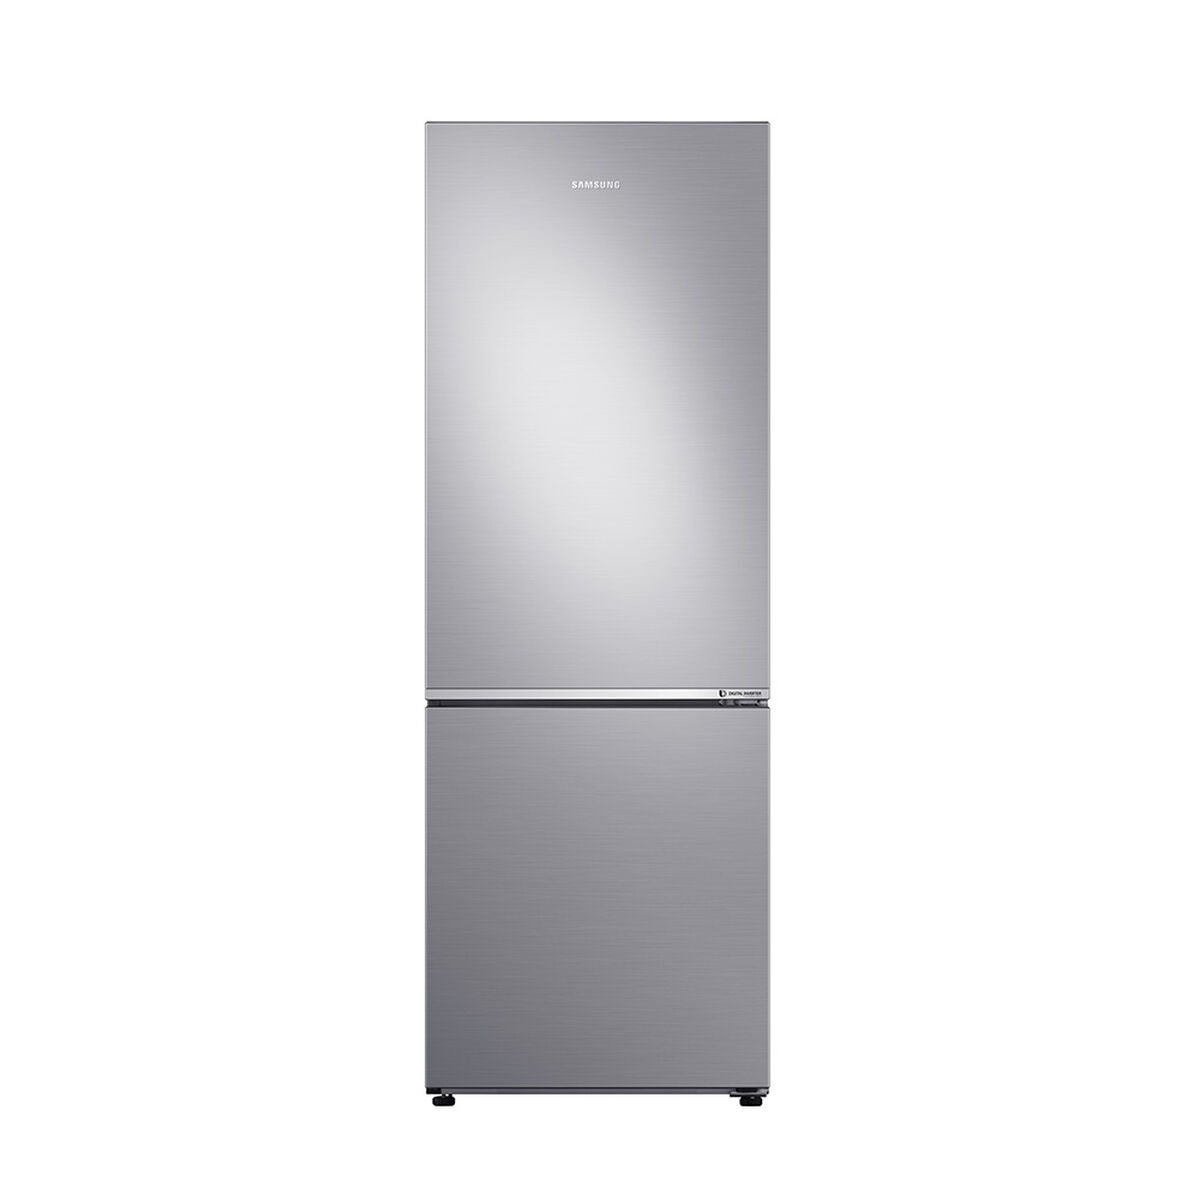 Refrigerador No Frost Samsung RB30N4020S8/ZS 290 lts